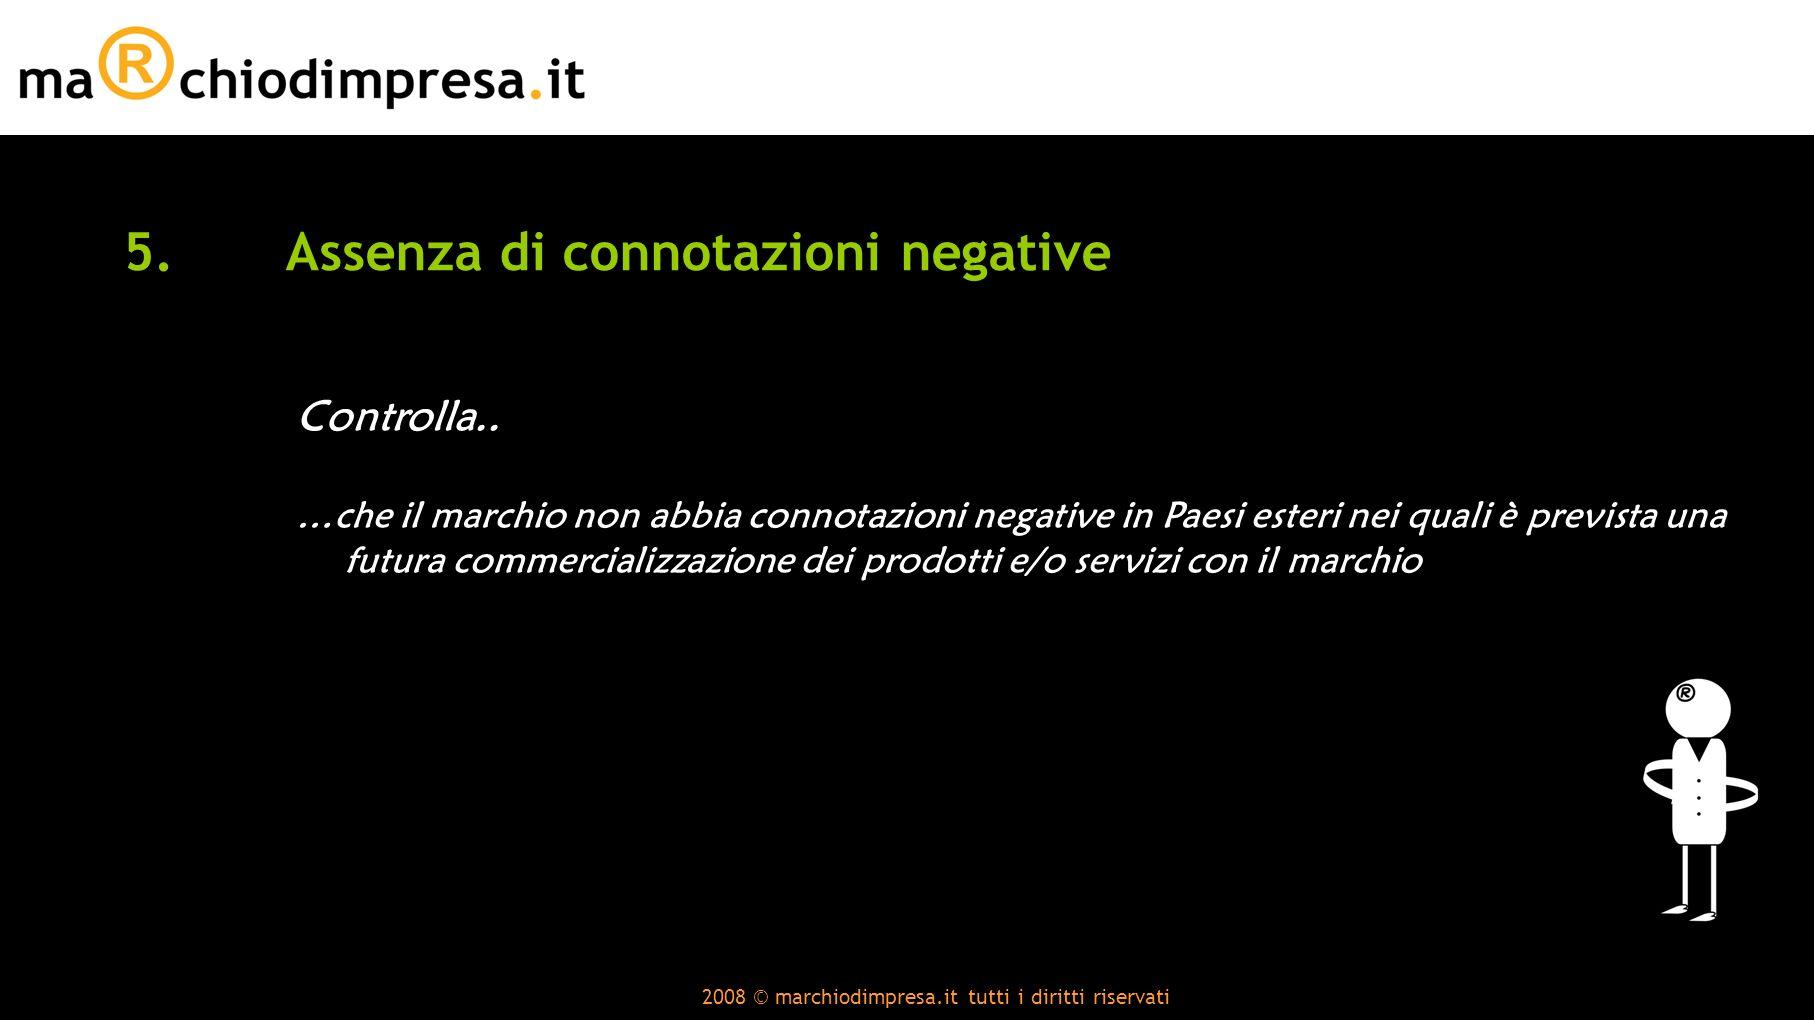 2008 © marchiodimpresa.it tutti i diritti riservati 5.Assenza di connotazioni negative Controlla..